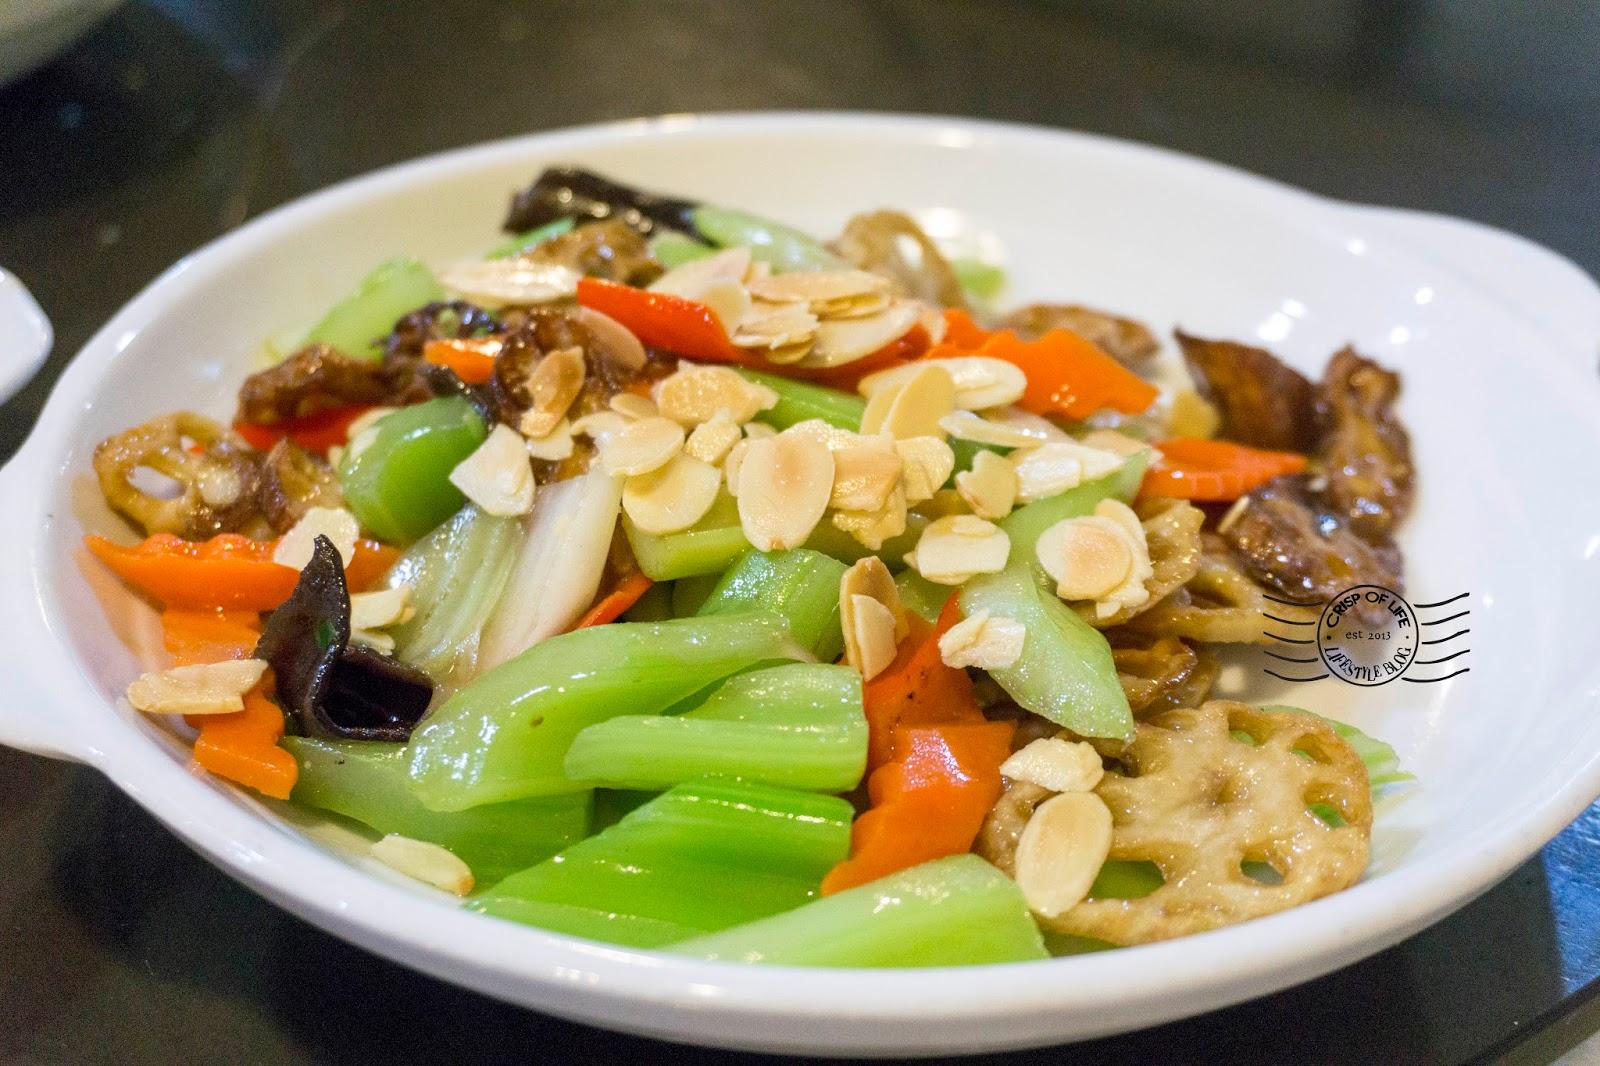 Foong Yean Cantonese Restaurant 方源粤菜餐厅 @ Bayan Baru, Penang